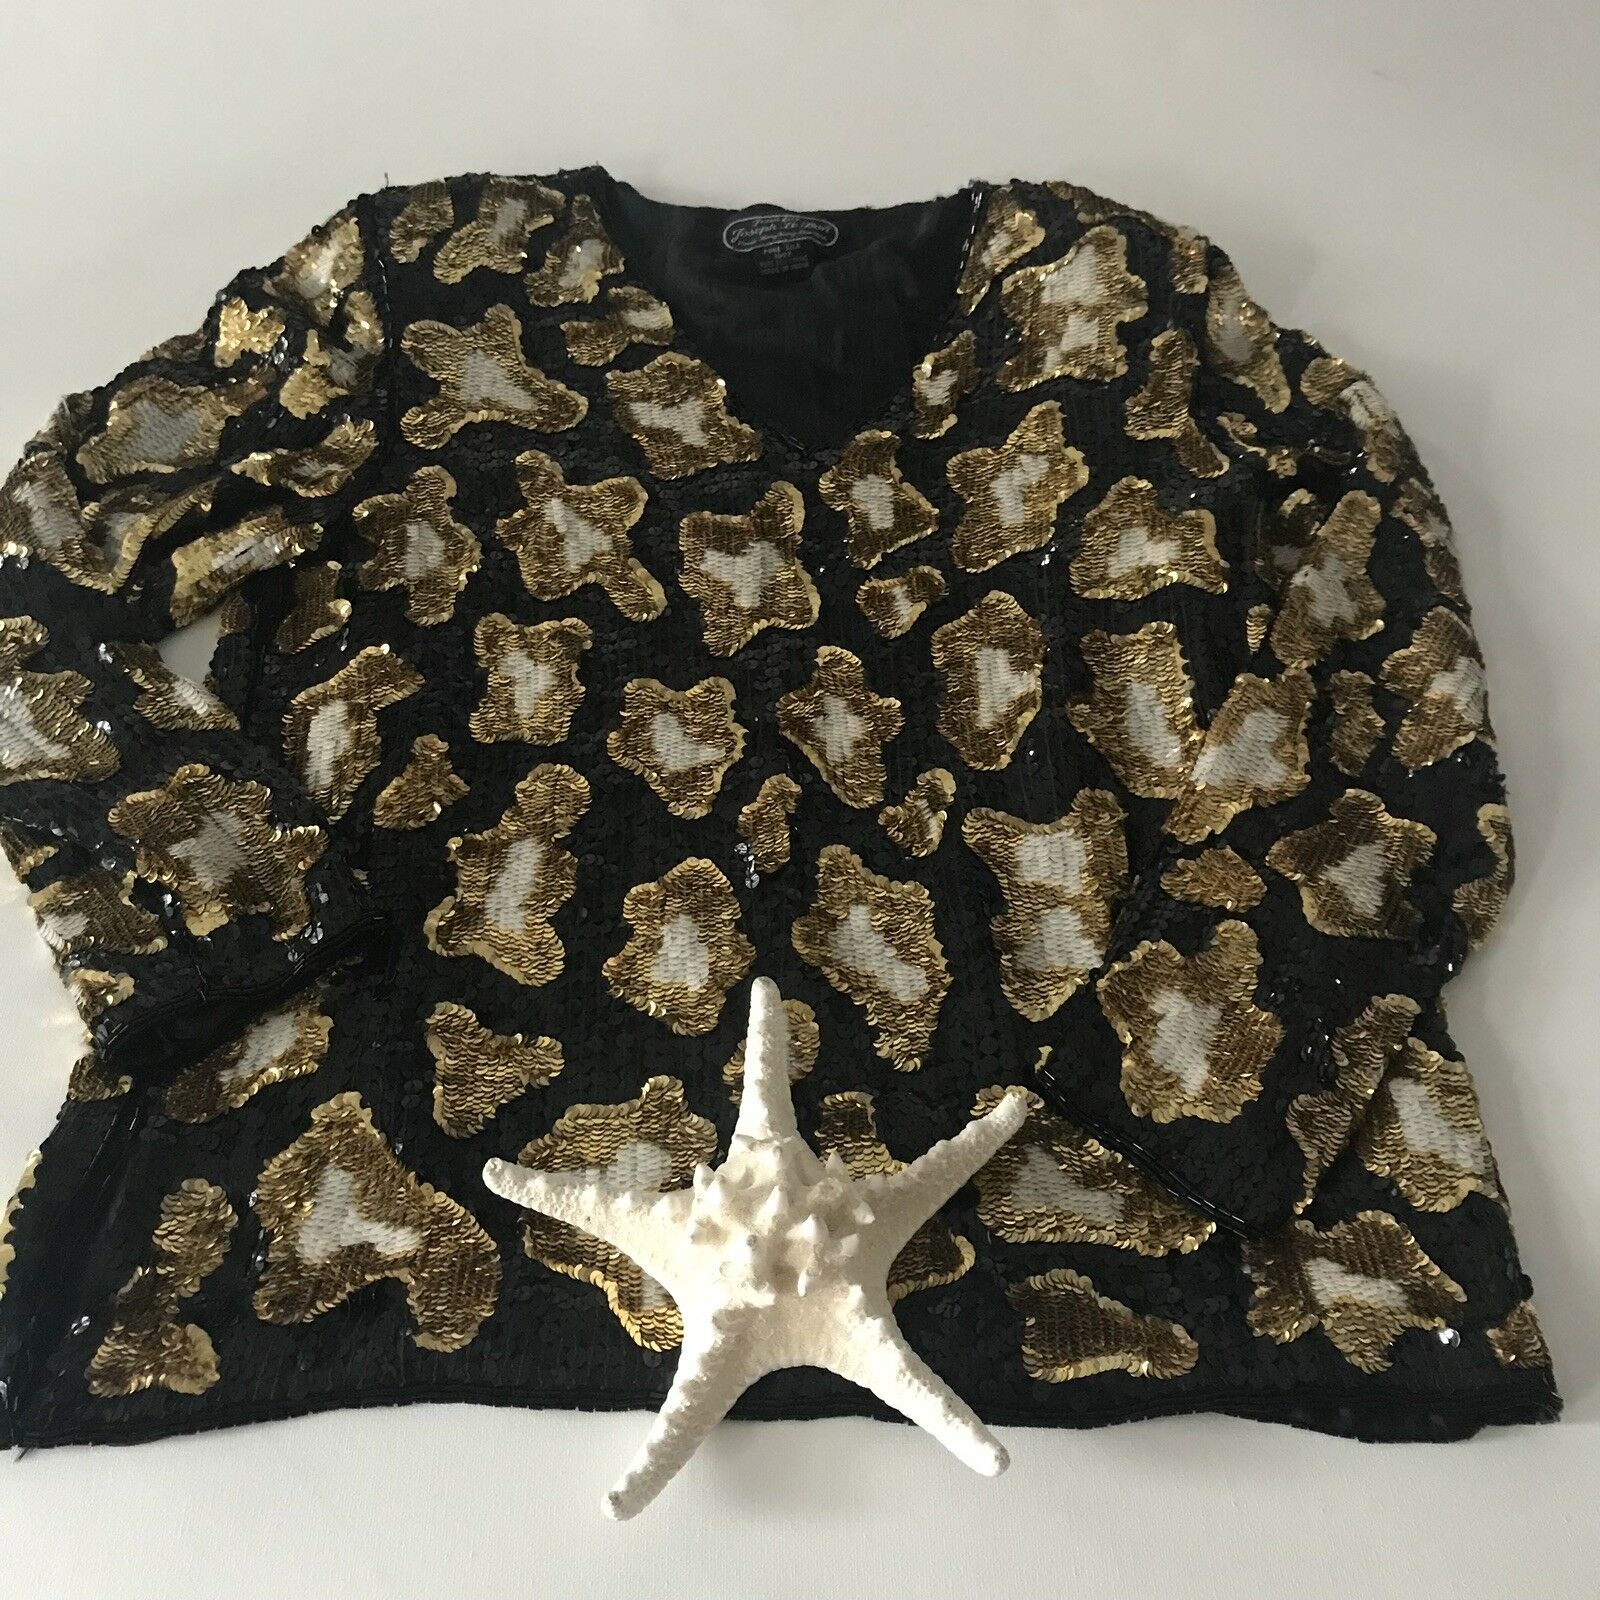 Jean Joseph LeBonVintage damen Blouse Sequin Leopard Large Silk Holiday Festive